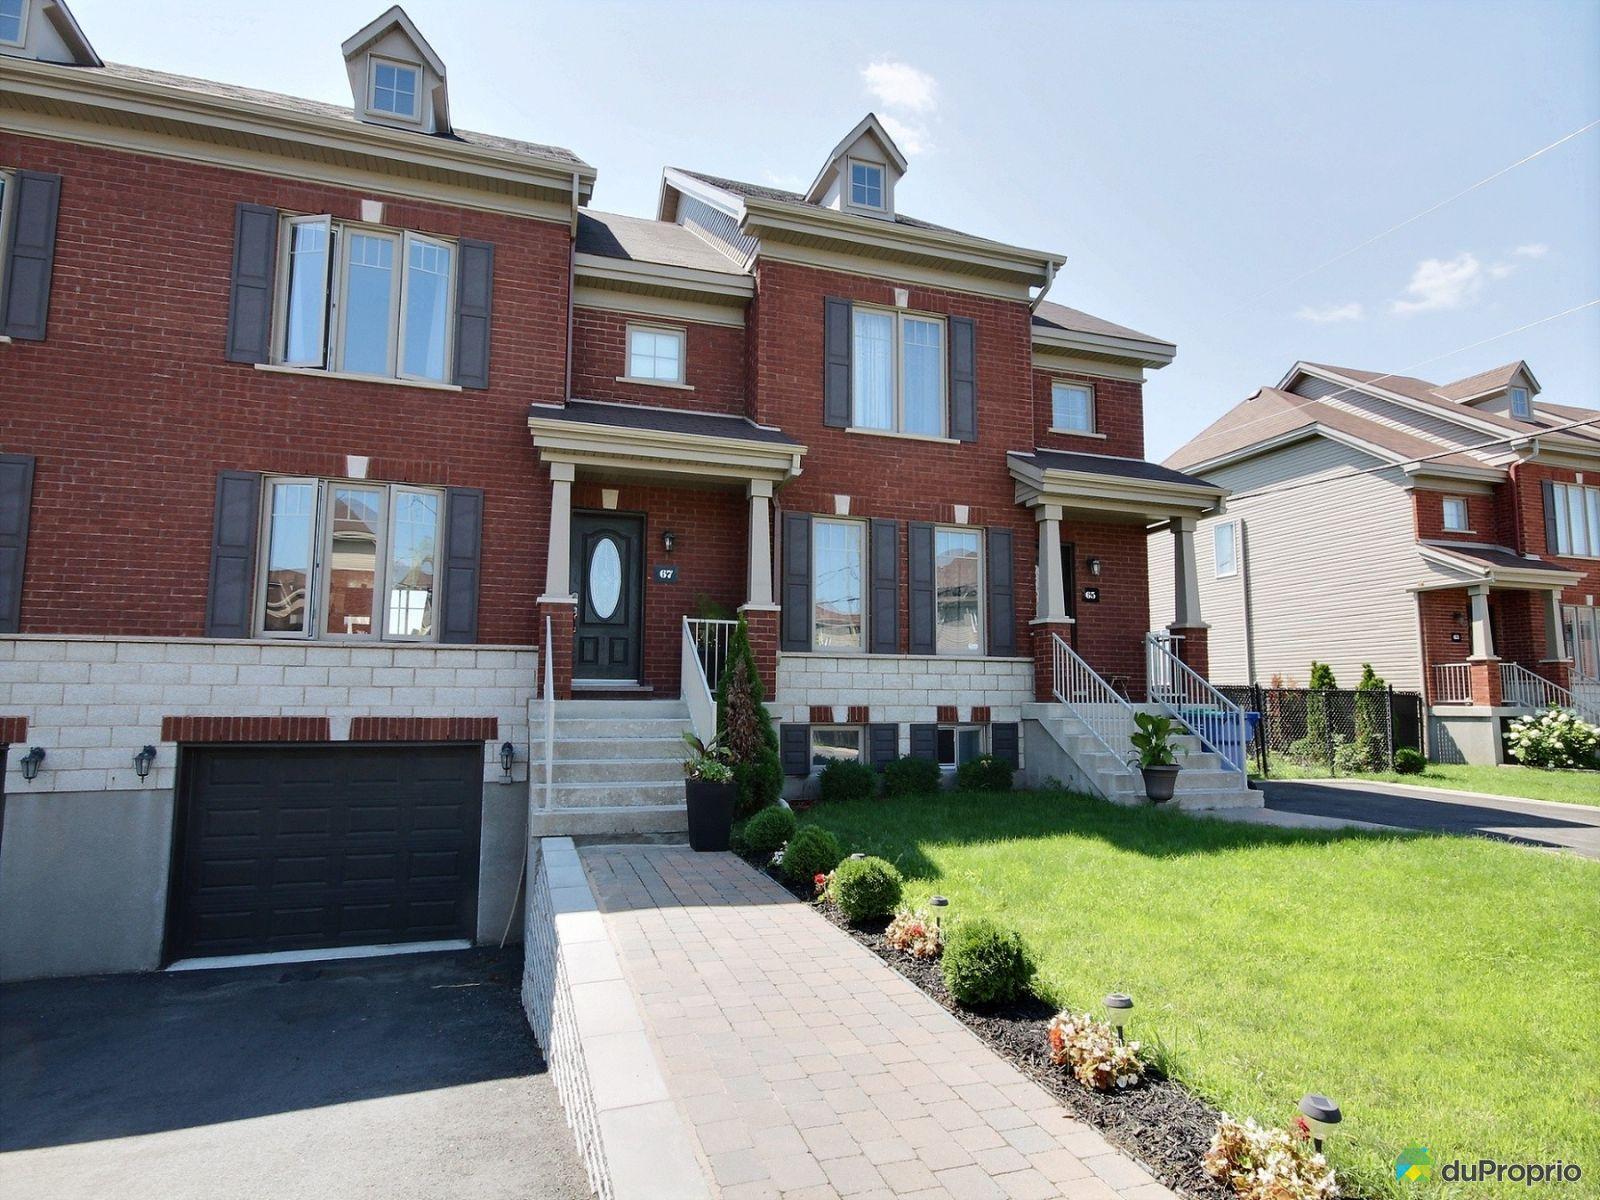 Maison vendre candiac 67 rue flaubert immobilier qu bec duproprio 714643 for Maison moderne a vendre candiac